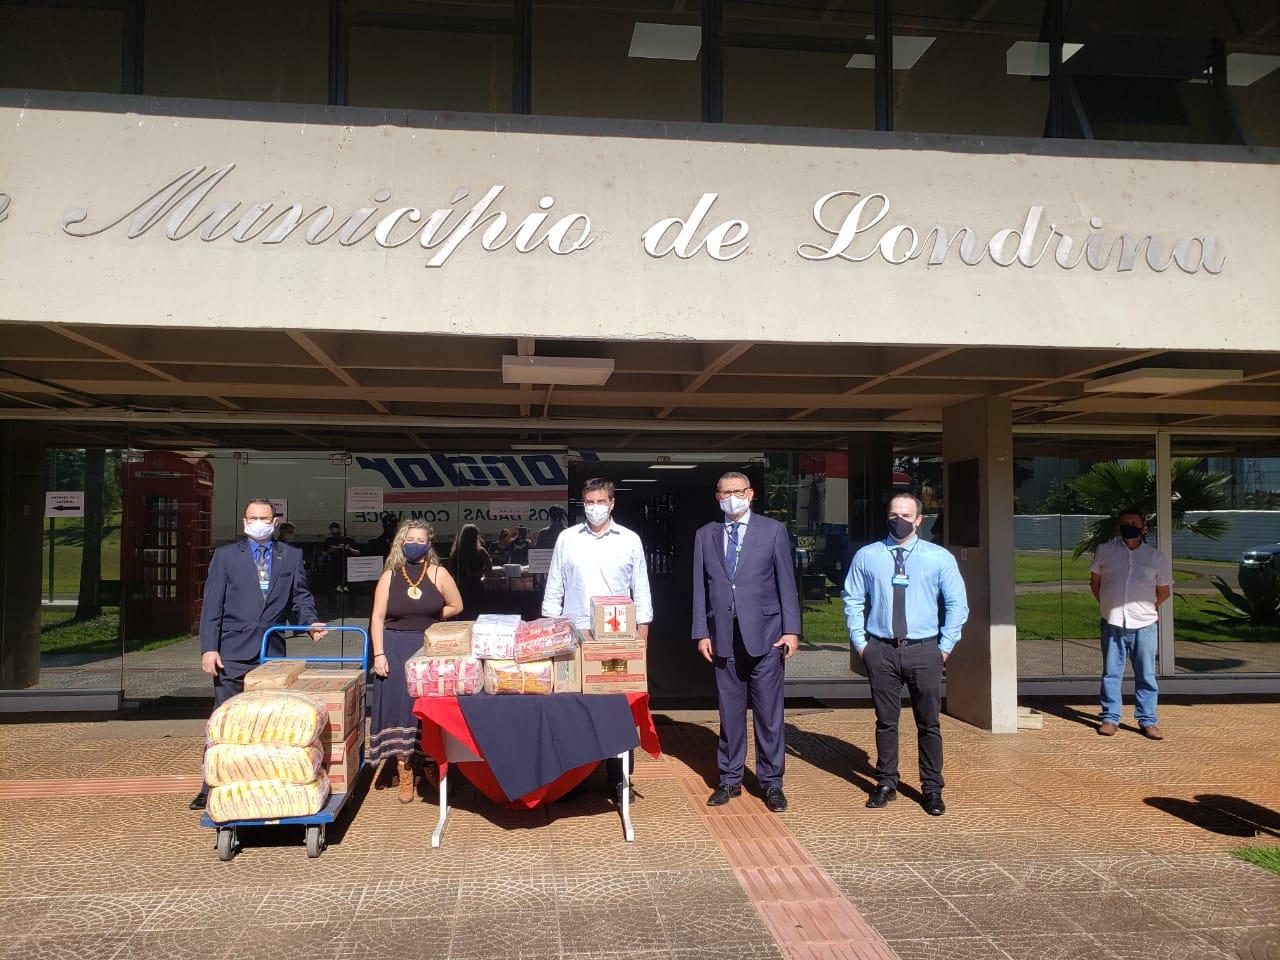 Condor doa quase 7 toneladas de alimentos para Londrina